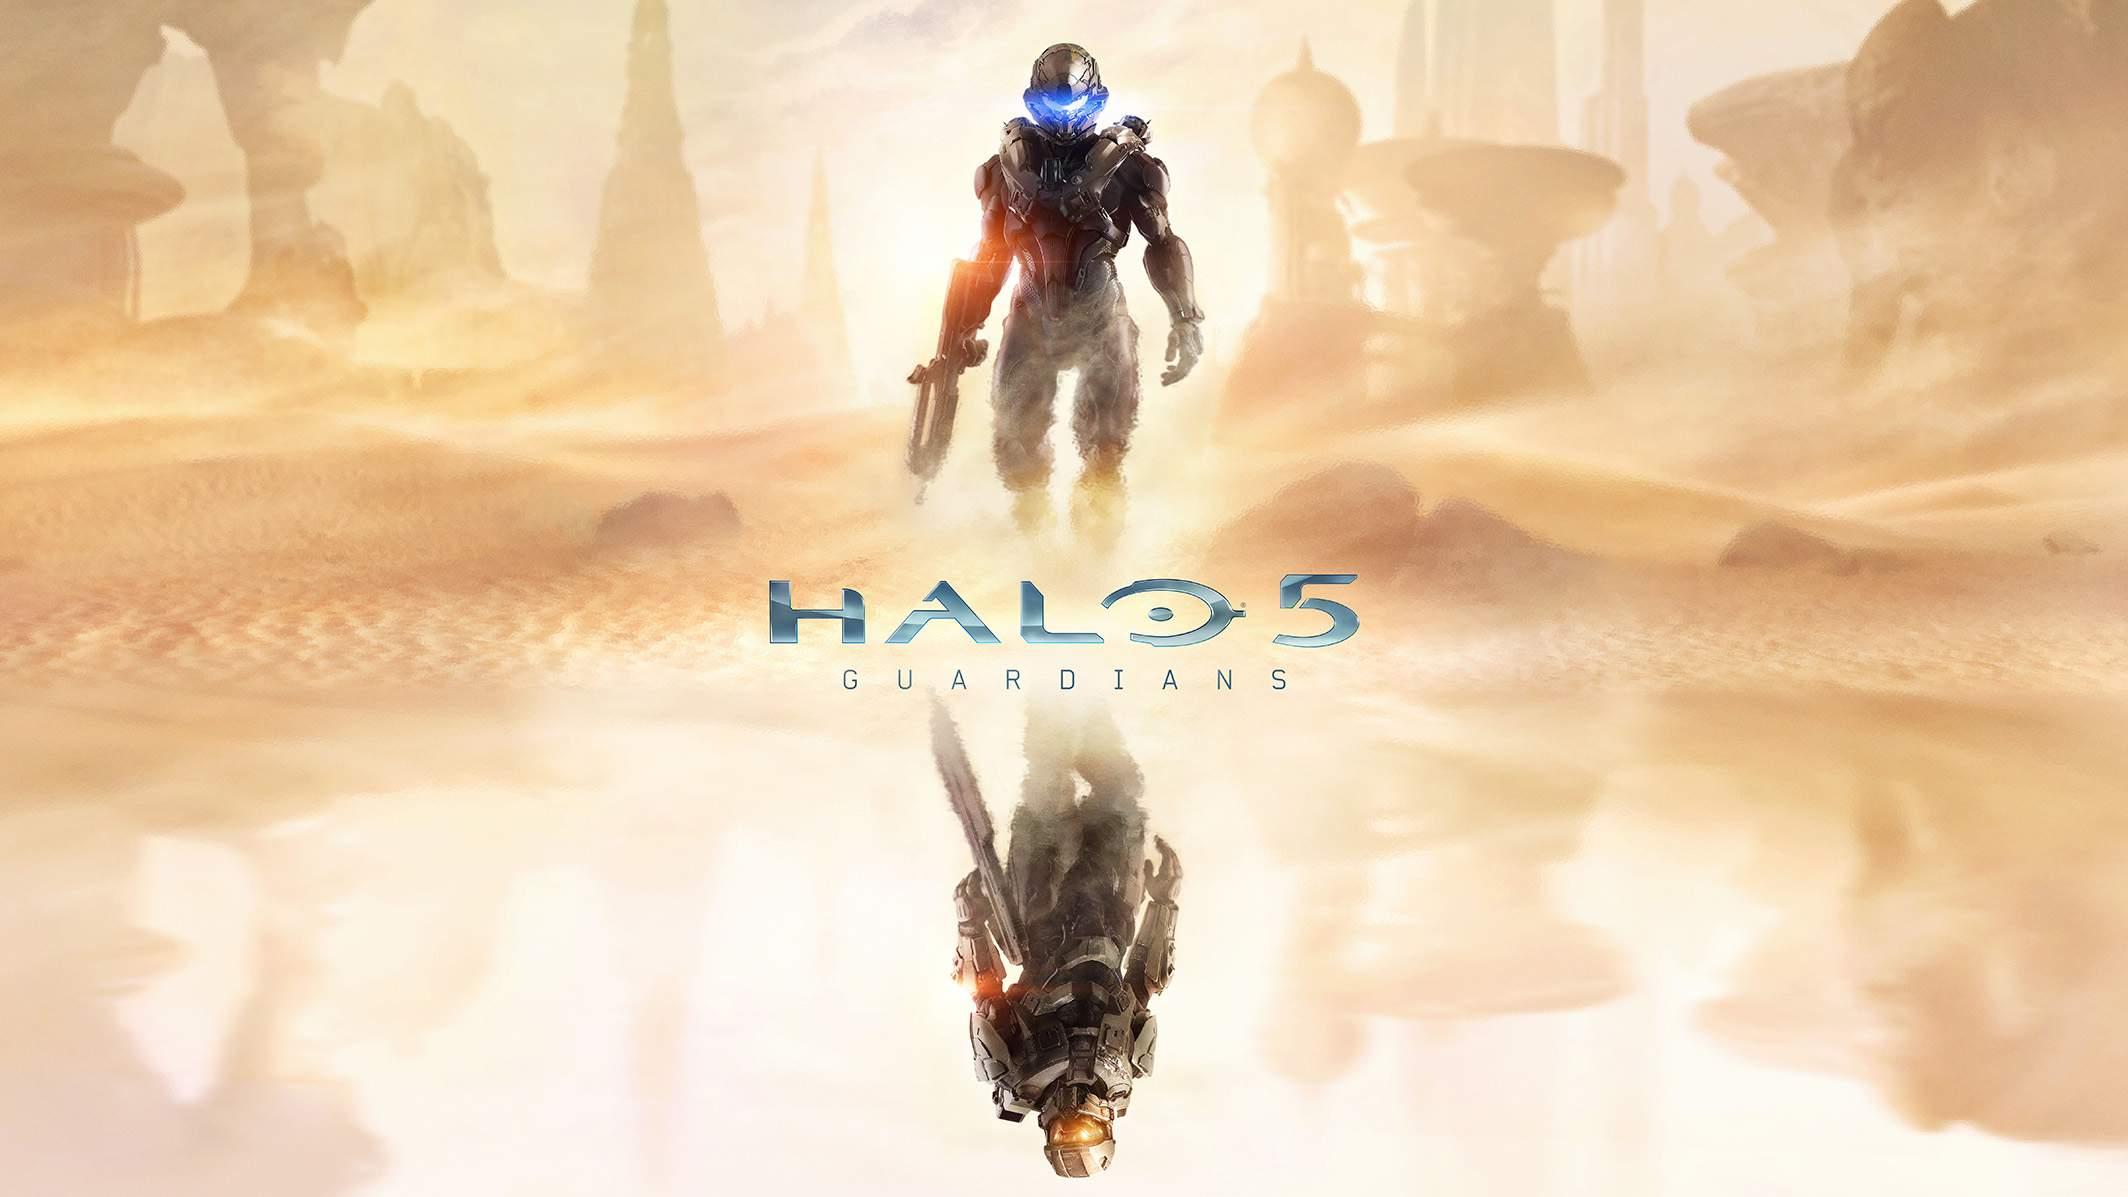 Halo5_Primary-TeaserArt_Horizontal_RGB_Final__1400237132_46.228.254.80